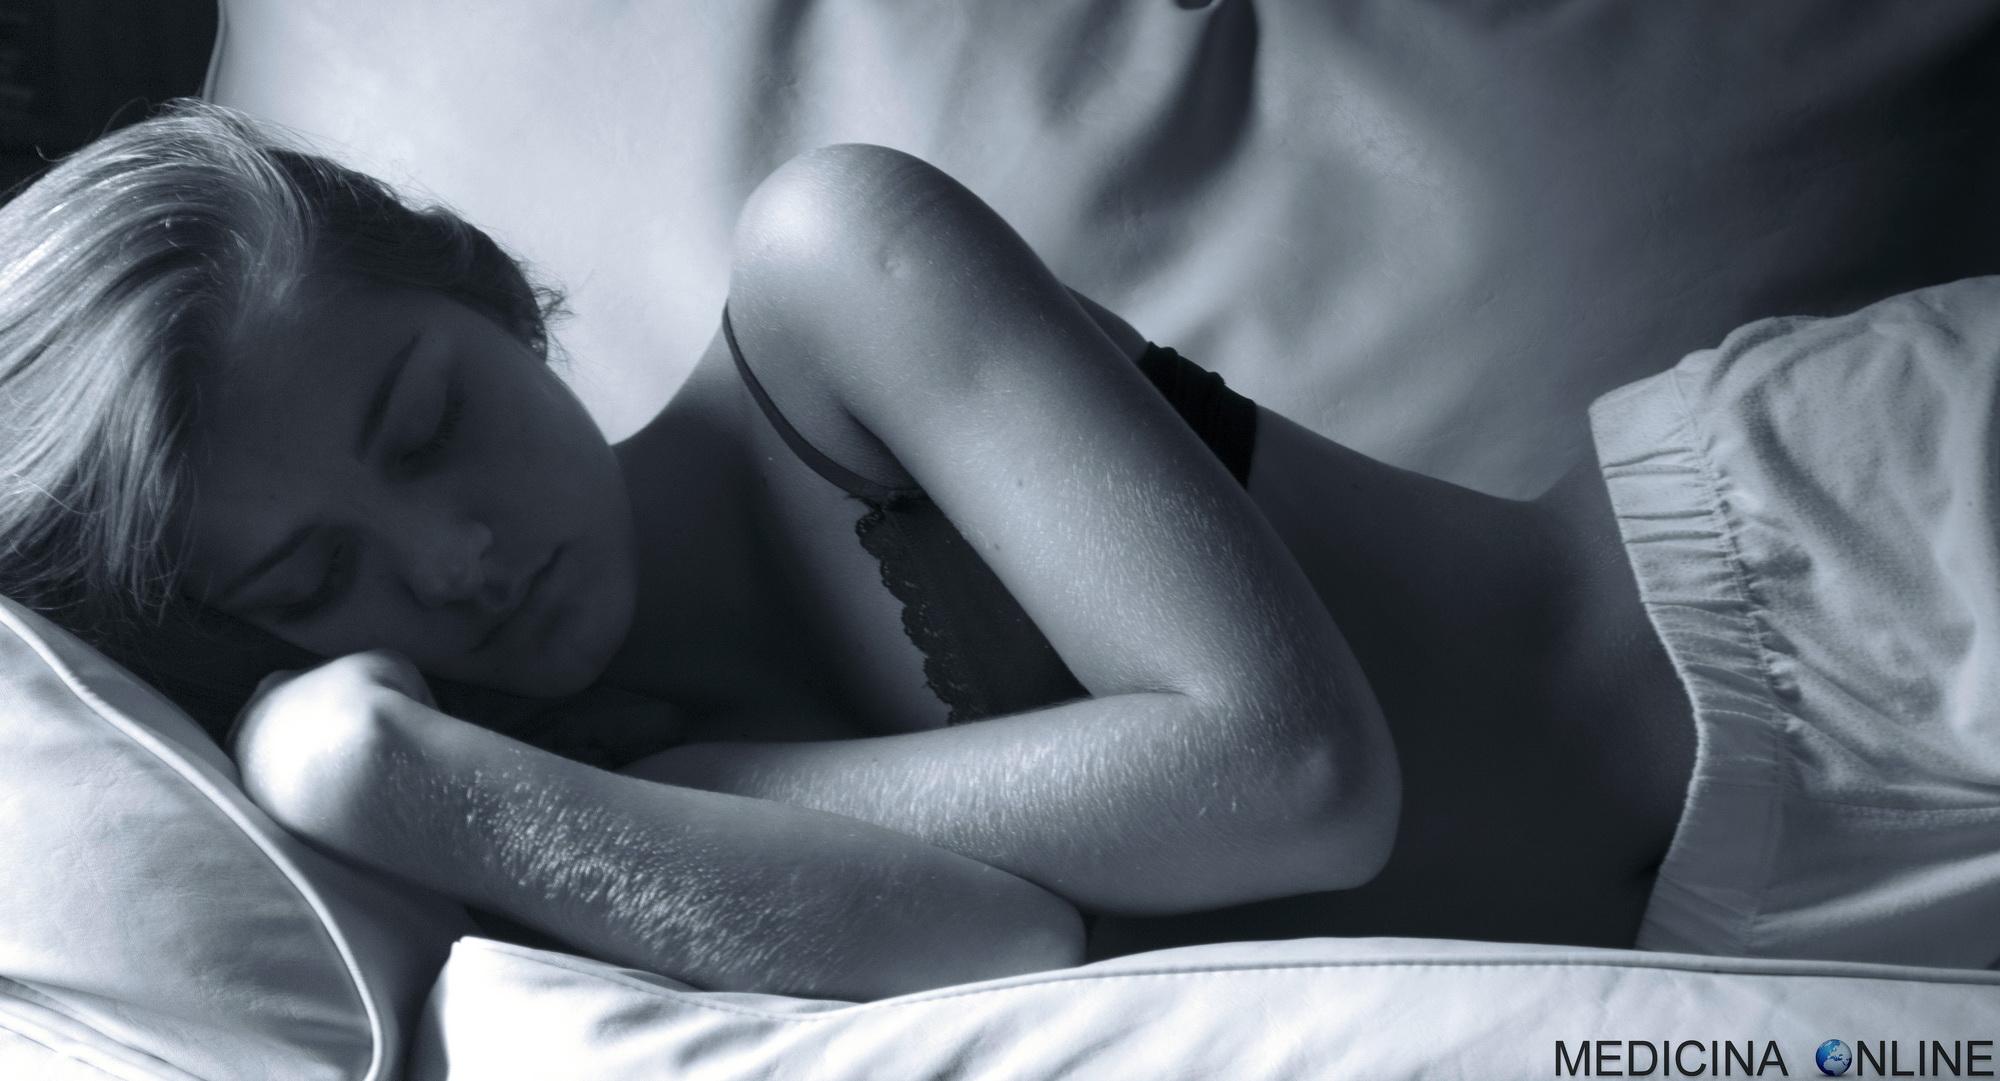 Orgasmo femminile mentre dorme